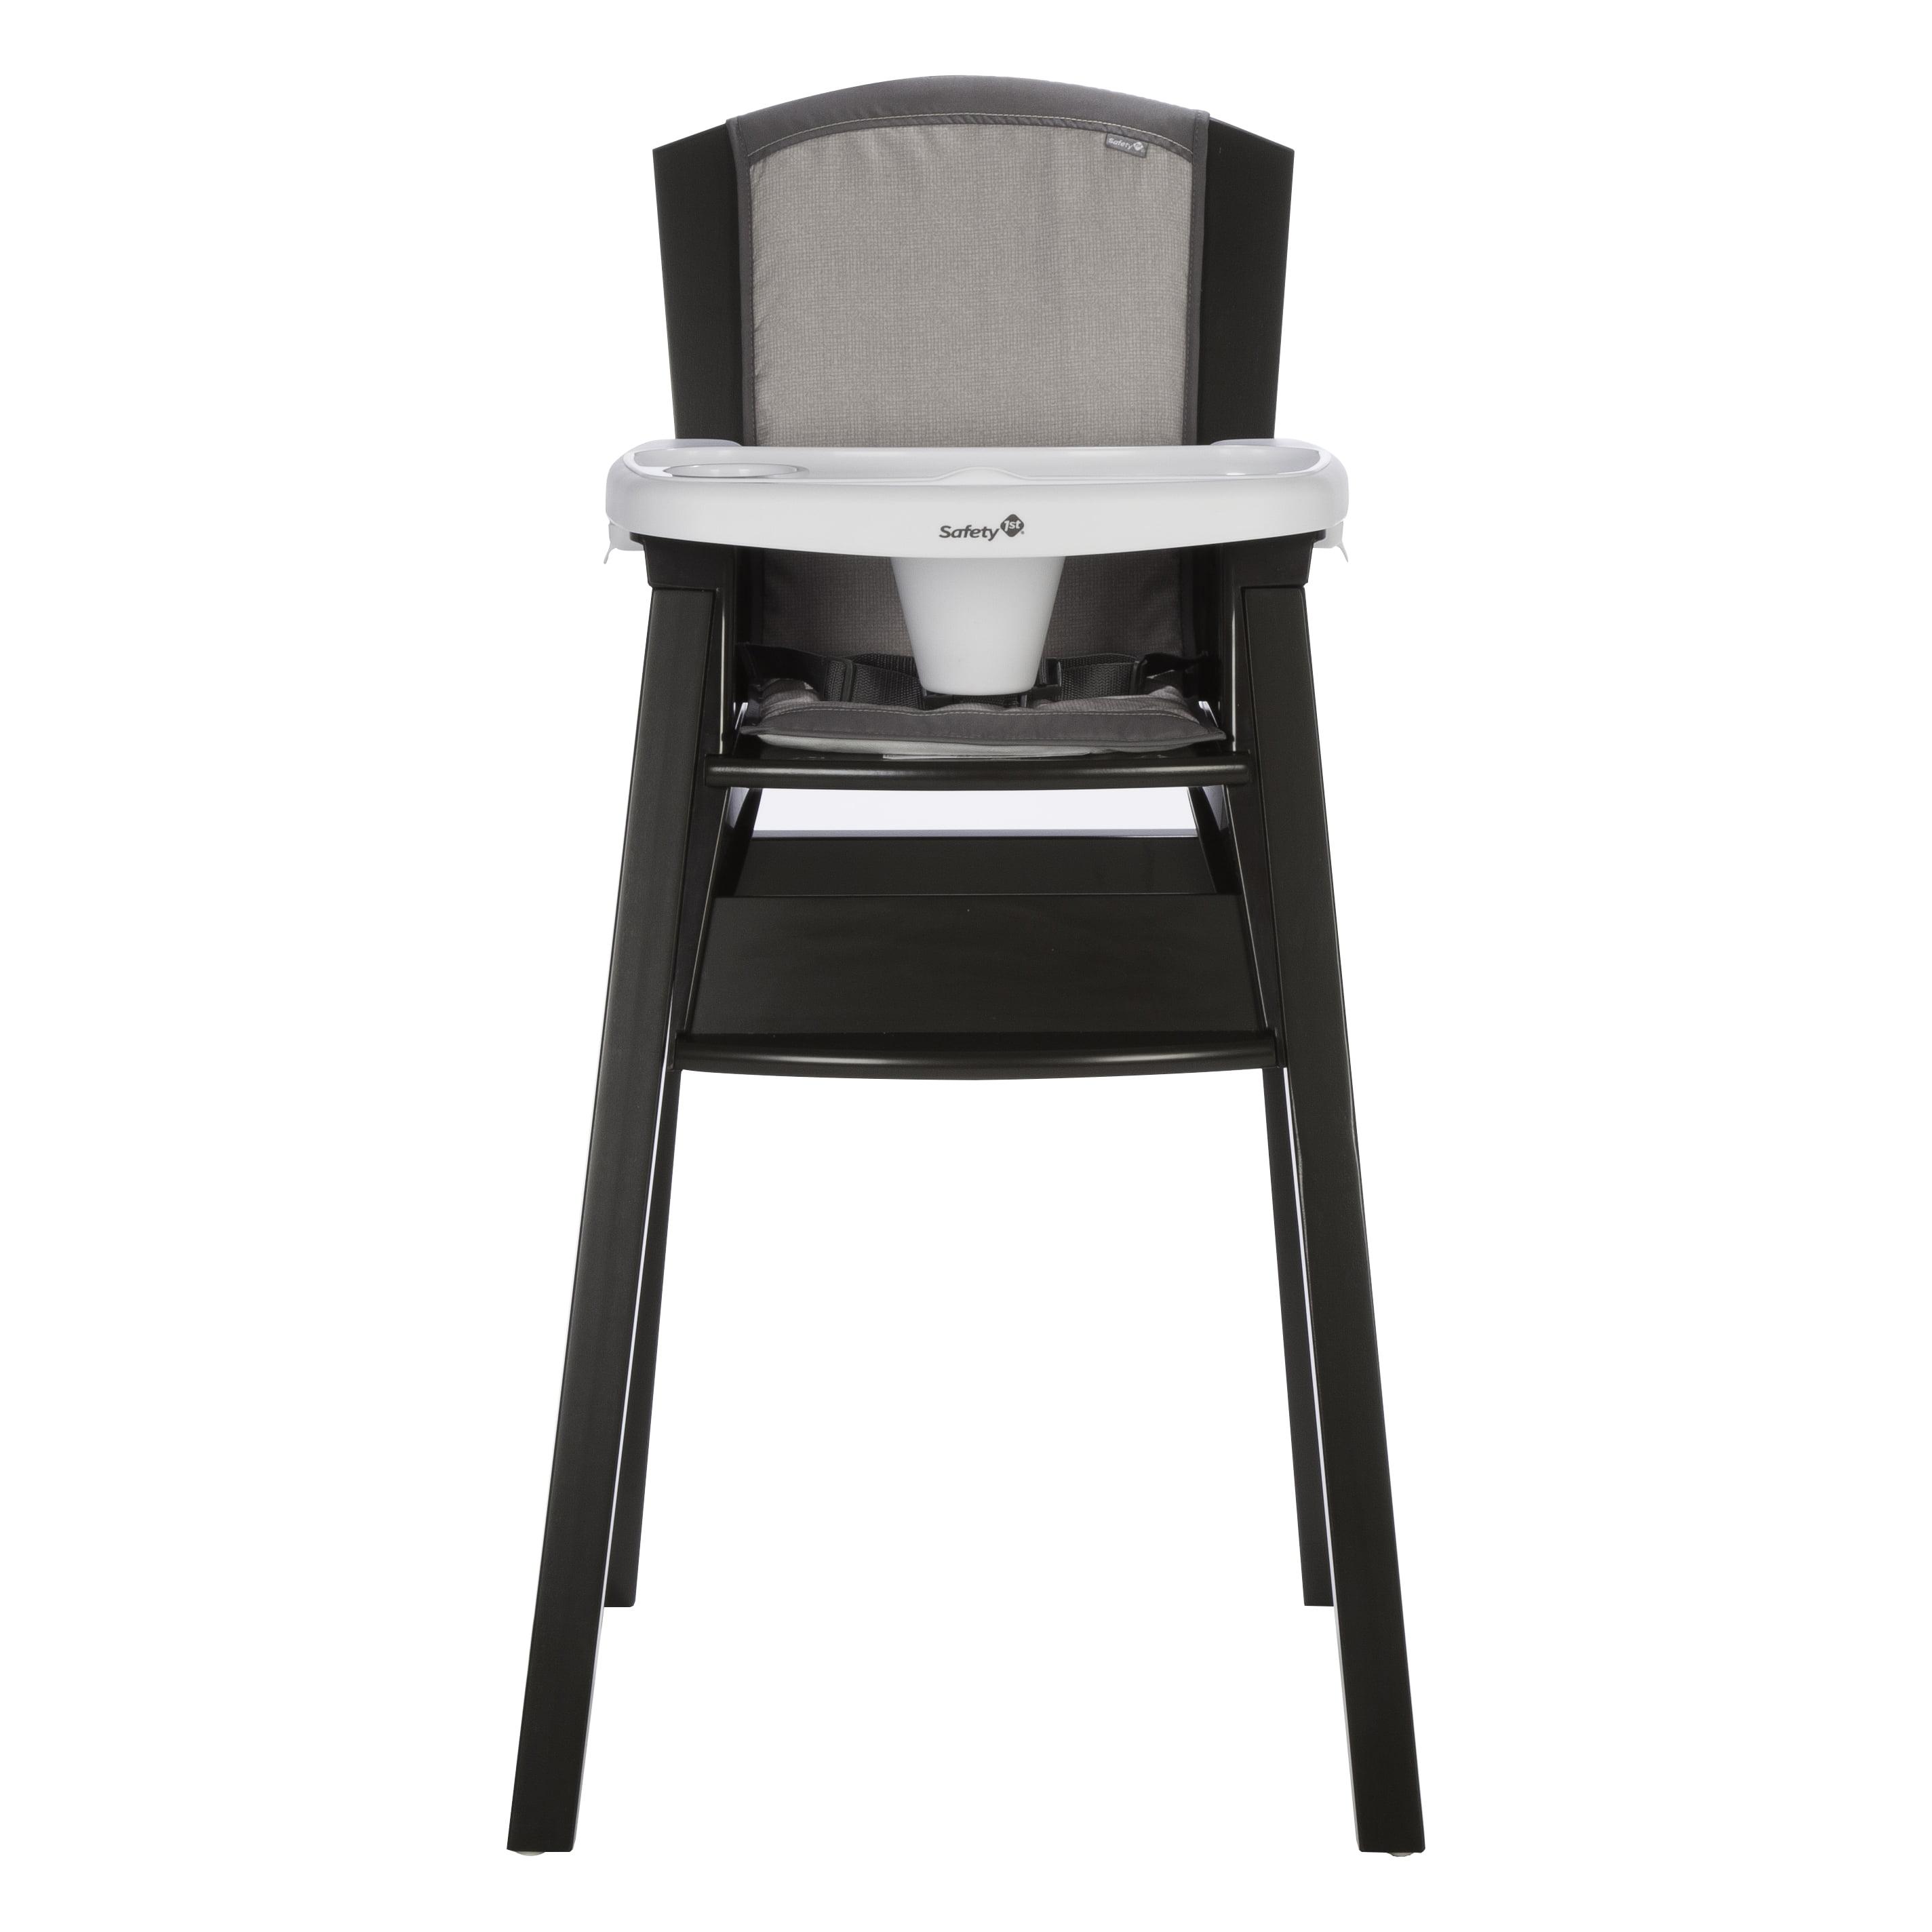 Safety 1st Wood High Chair, Beaumont - Walmart.com